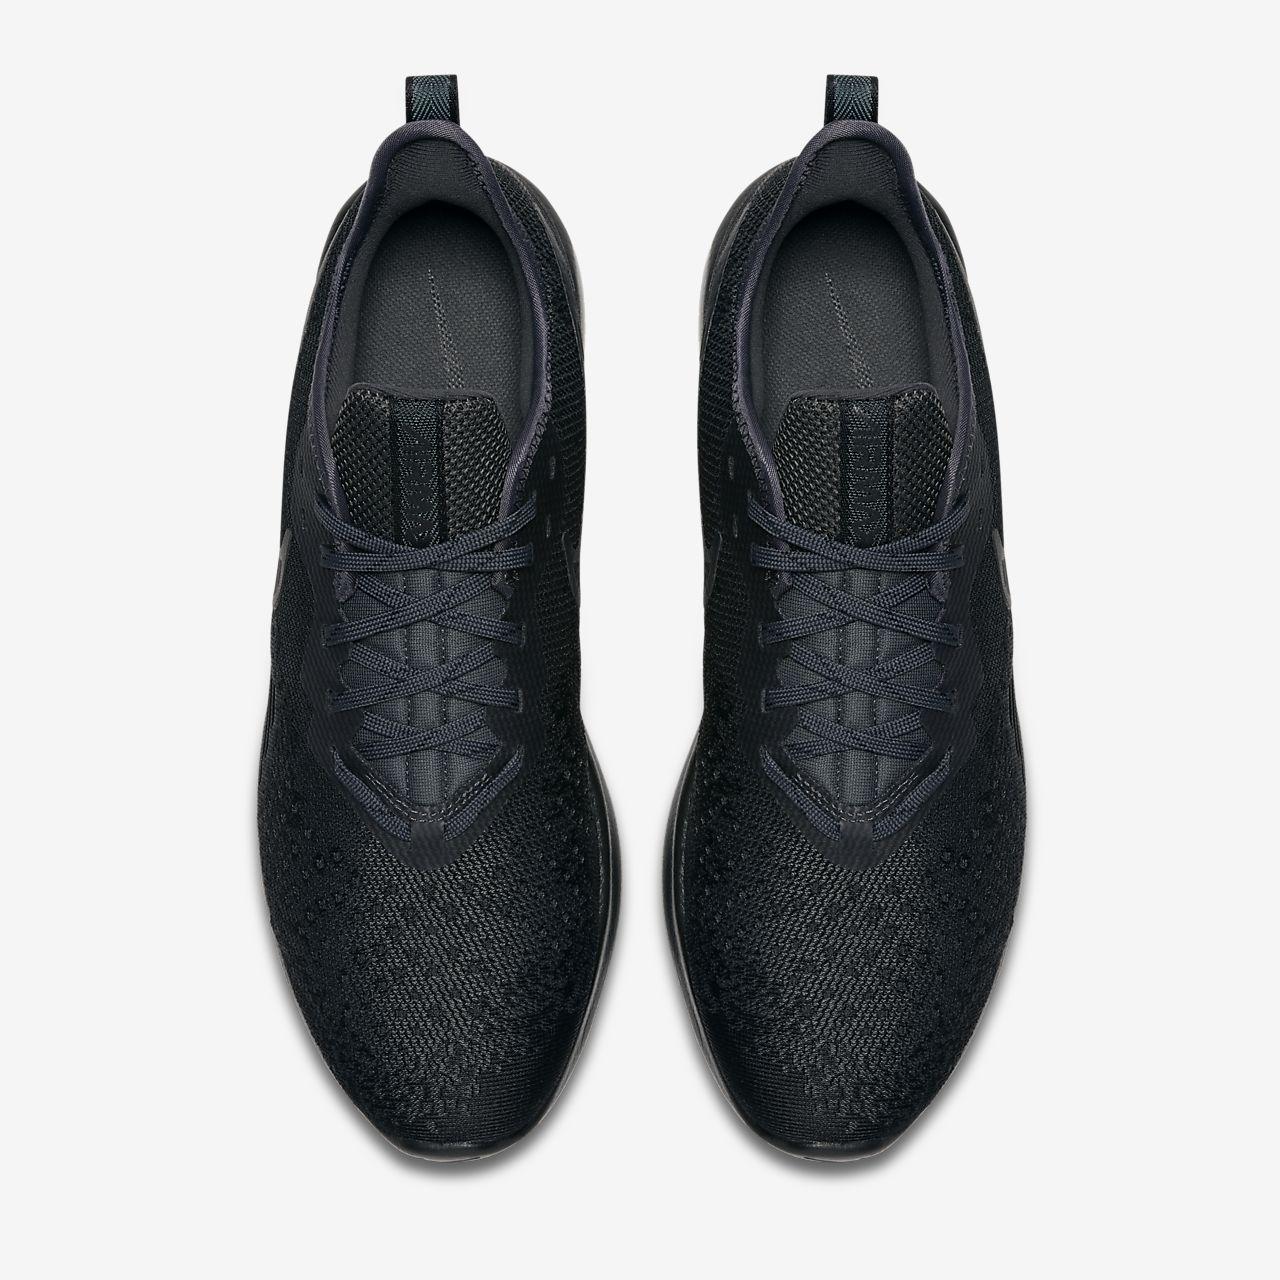 Nike Air Max Sequent 4 Men s Shoe. Nike.com HU 9a6f723d1ac34